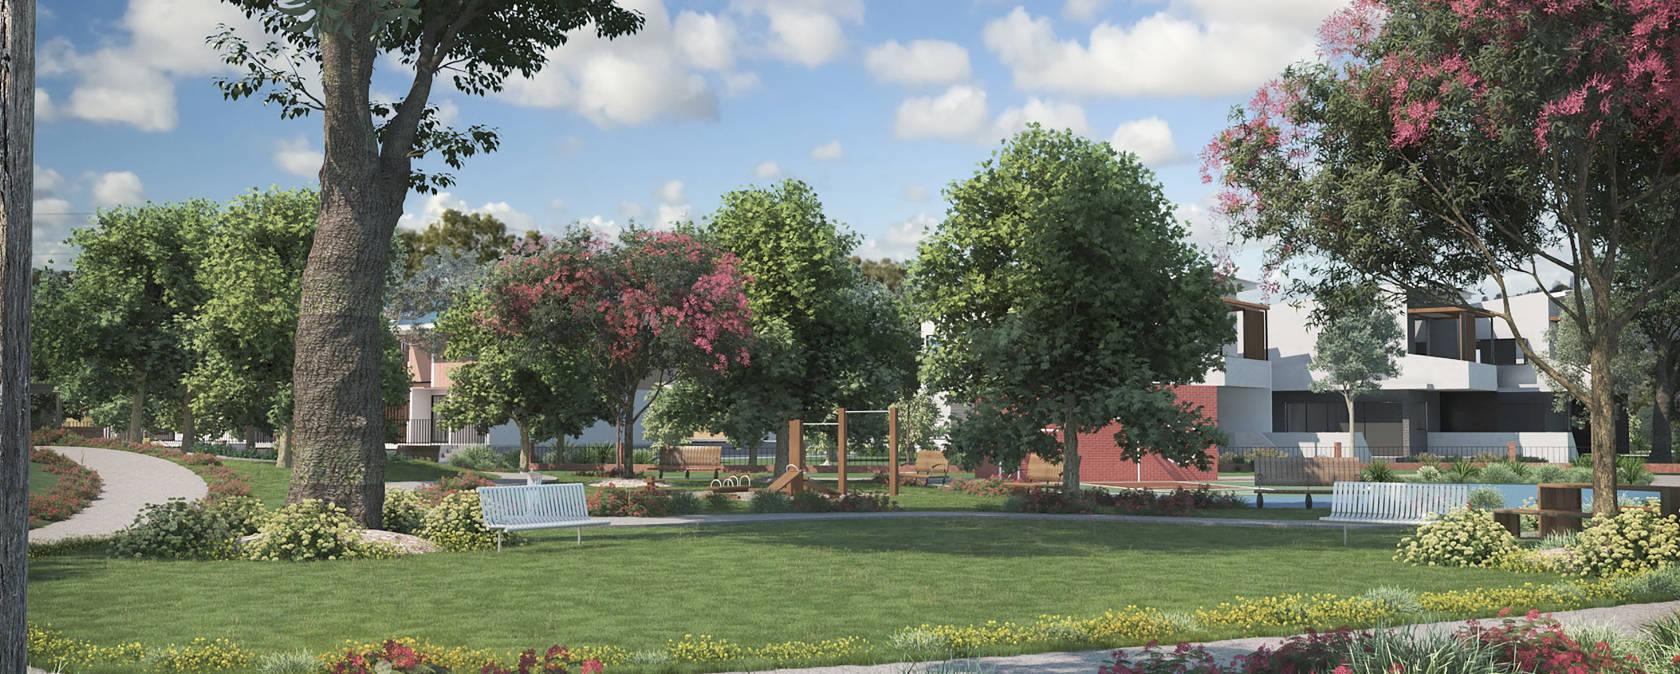 Shenton Park urban development